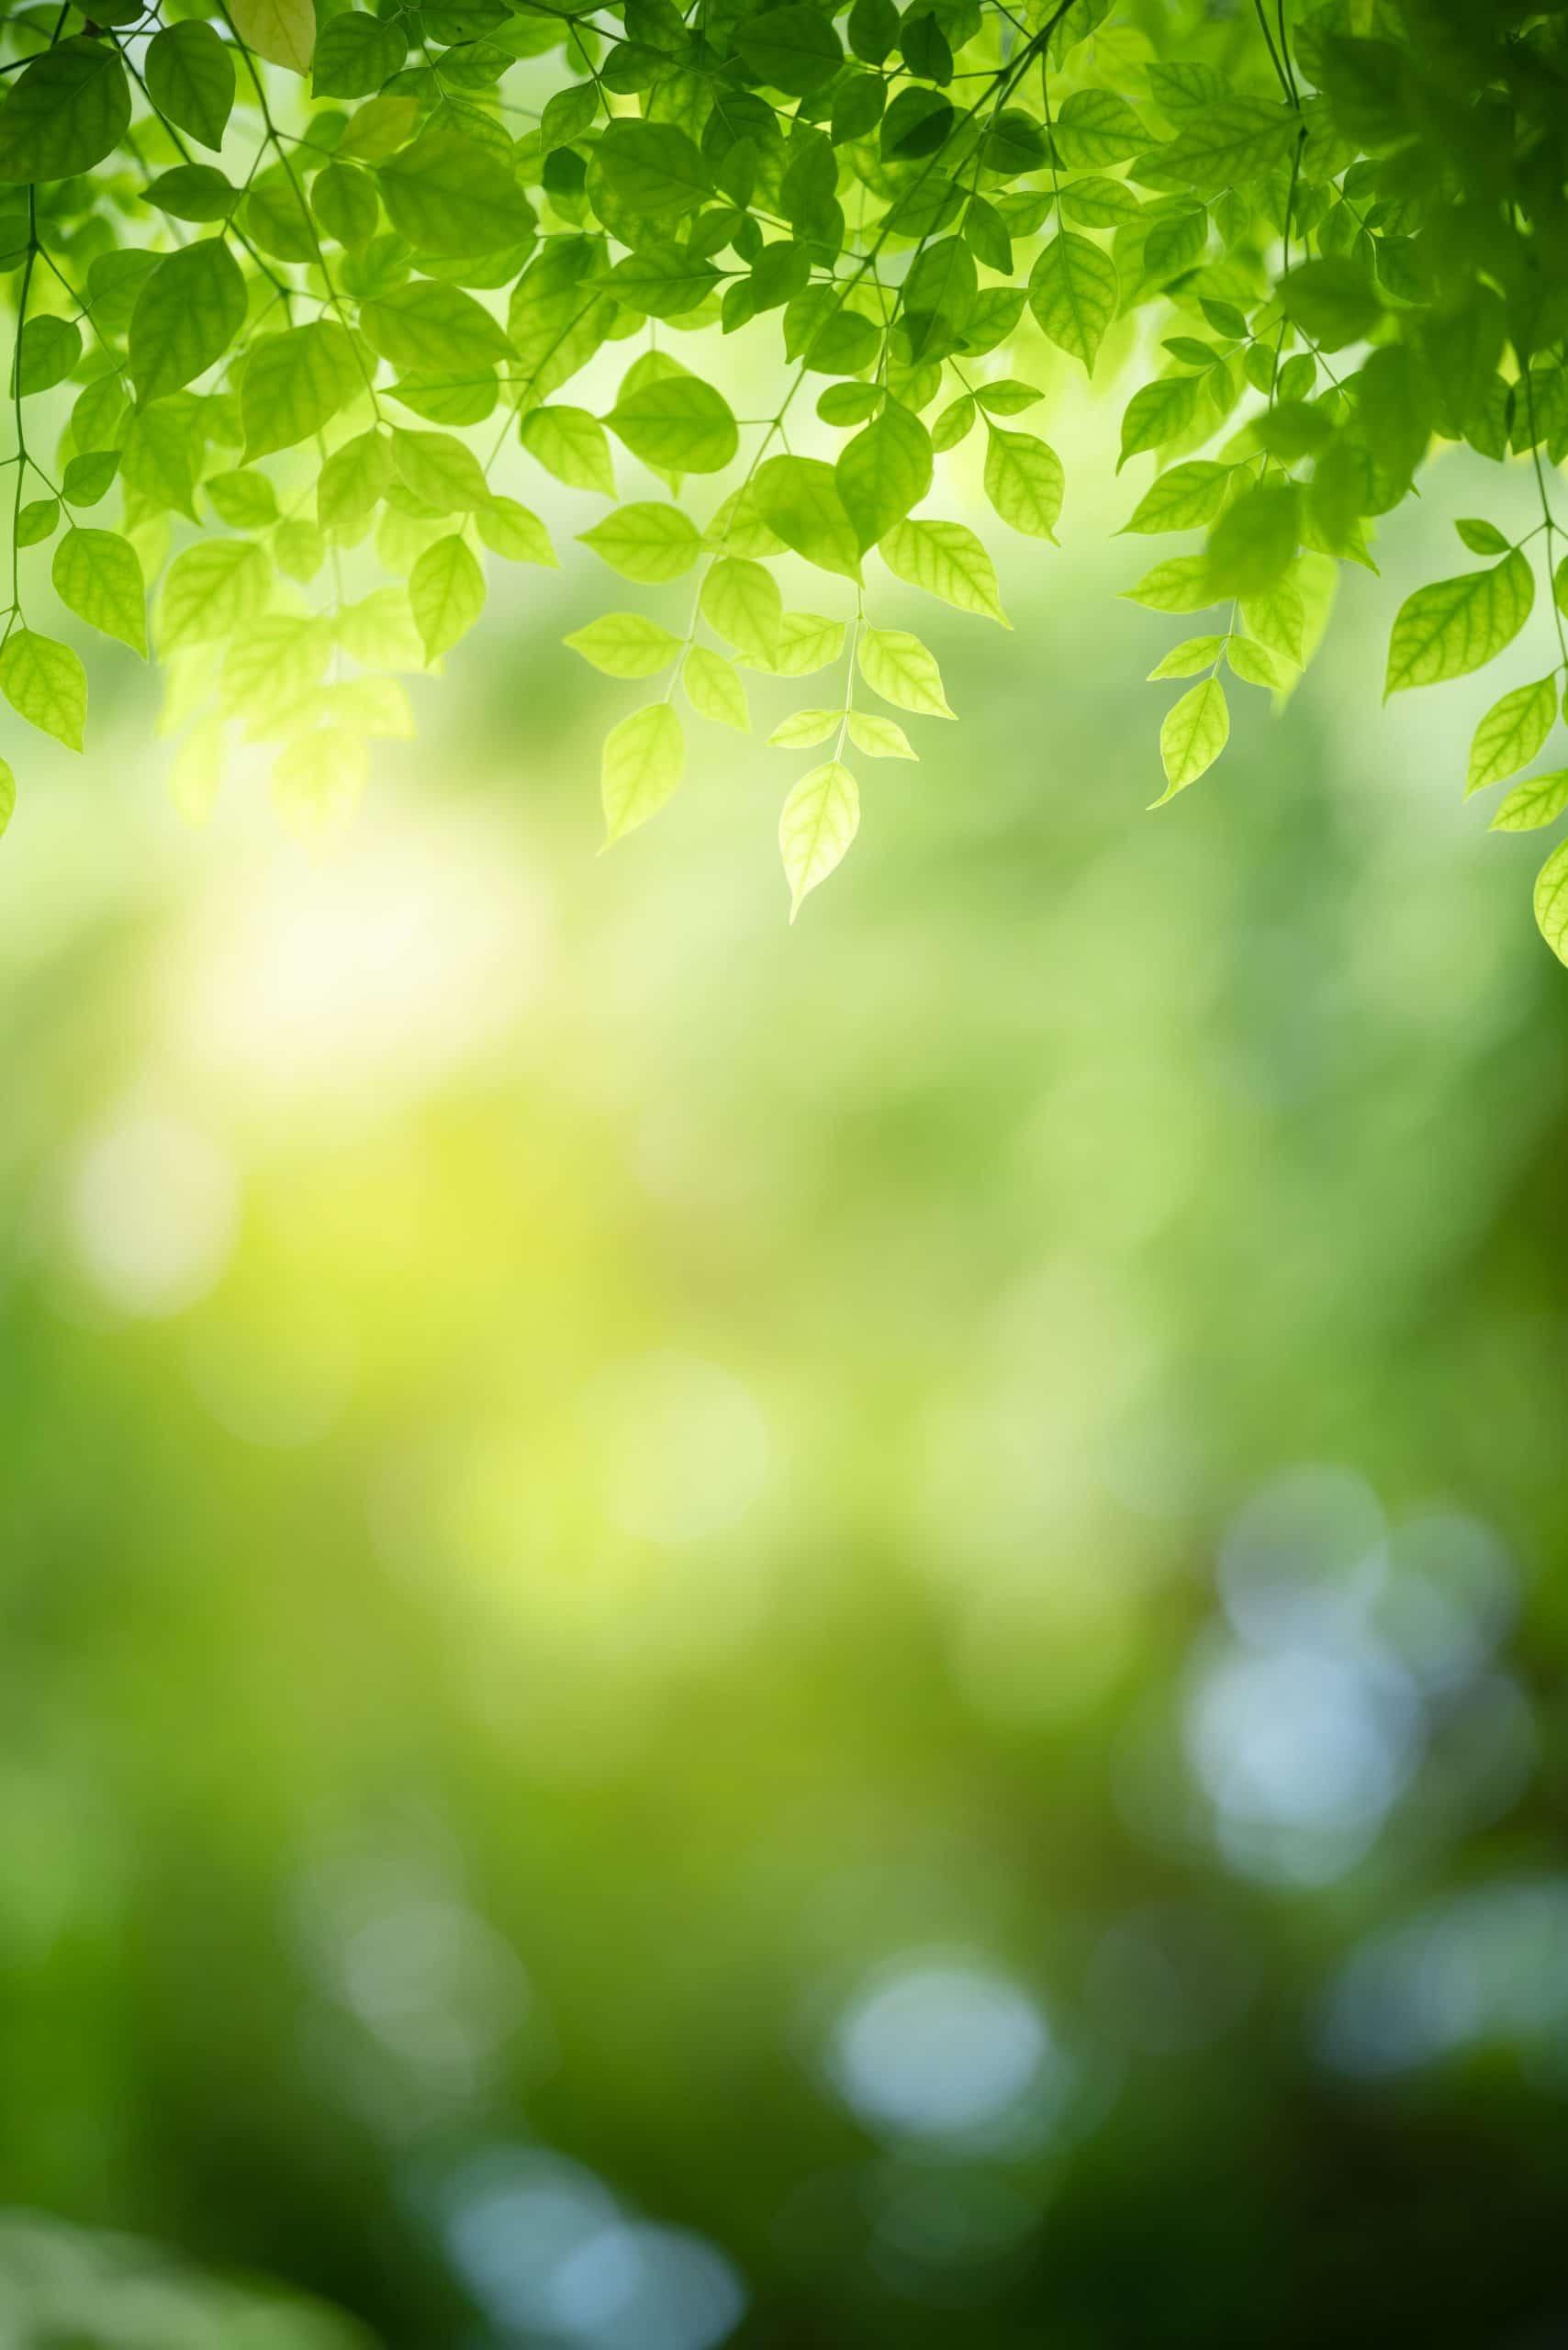 Lys i bøgeblade fobibehandling.dk behandling af edderkopfobi (araknofobi)